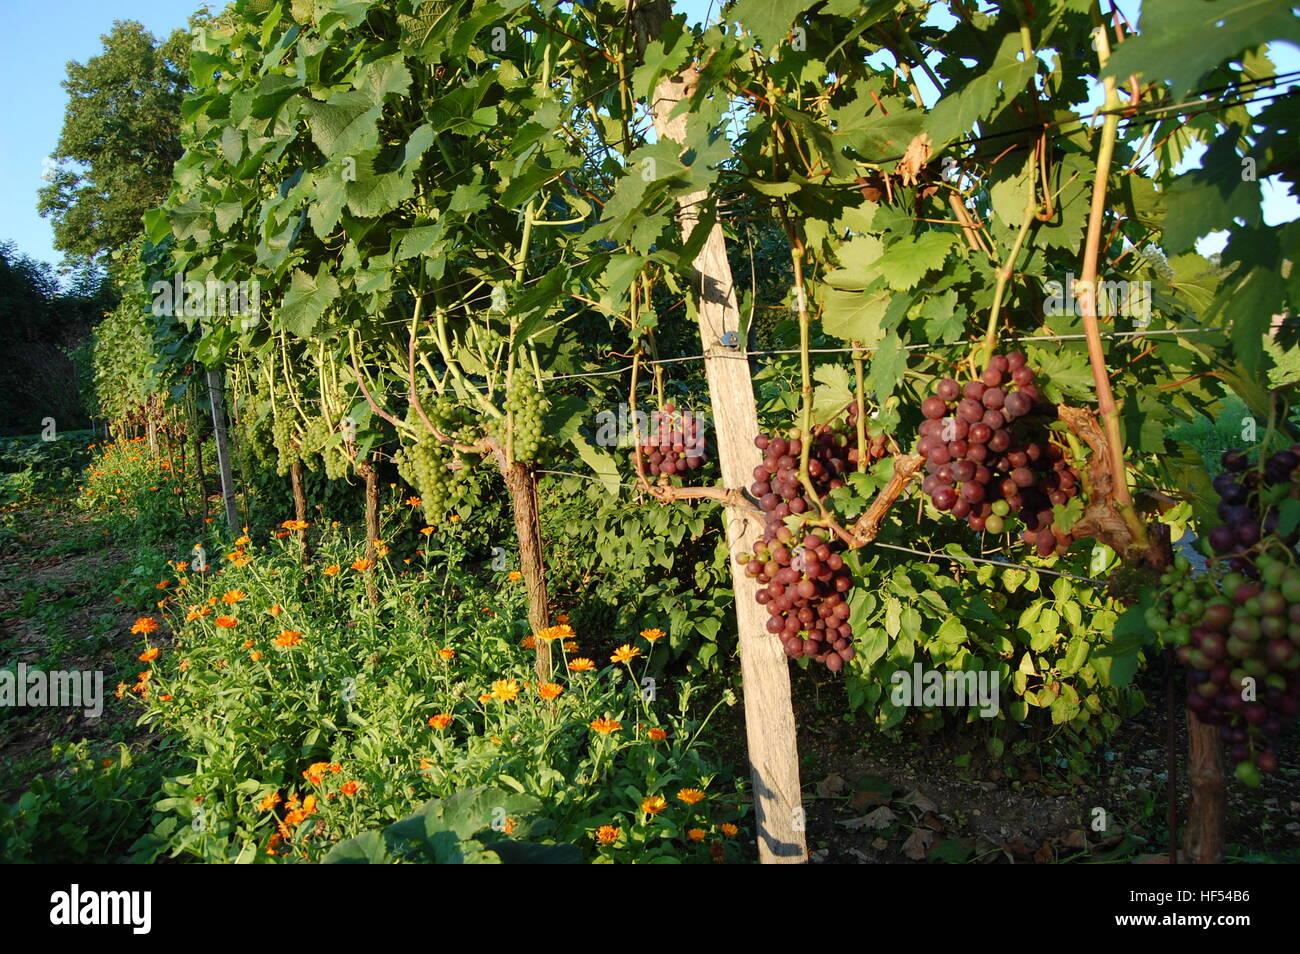 Leckere Reife Weintrauen in Den Weinreben Stockbild